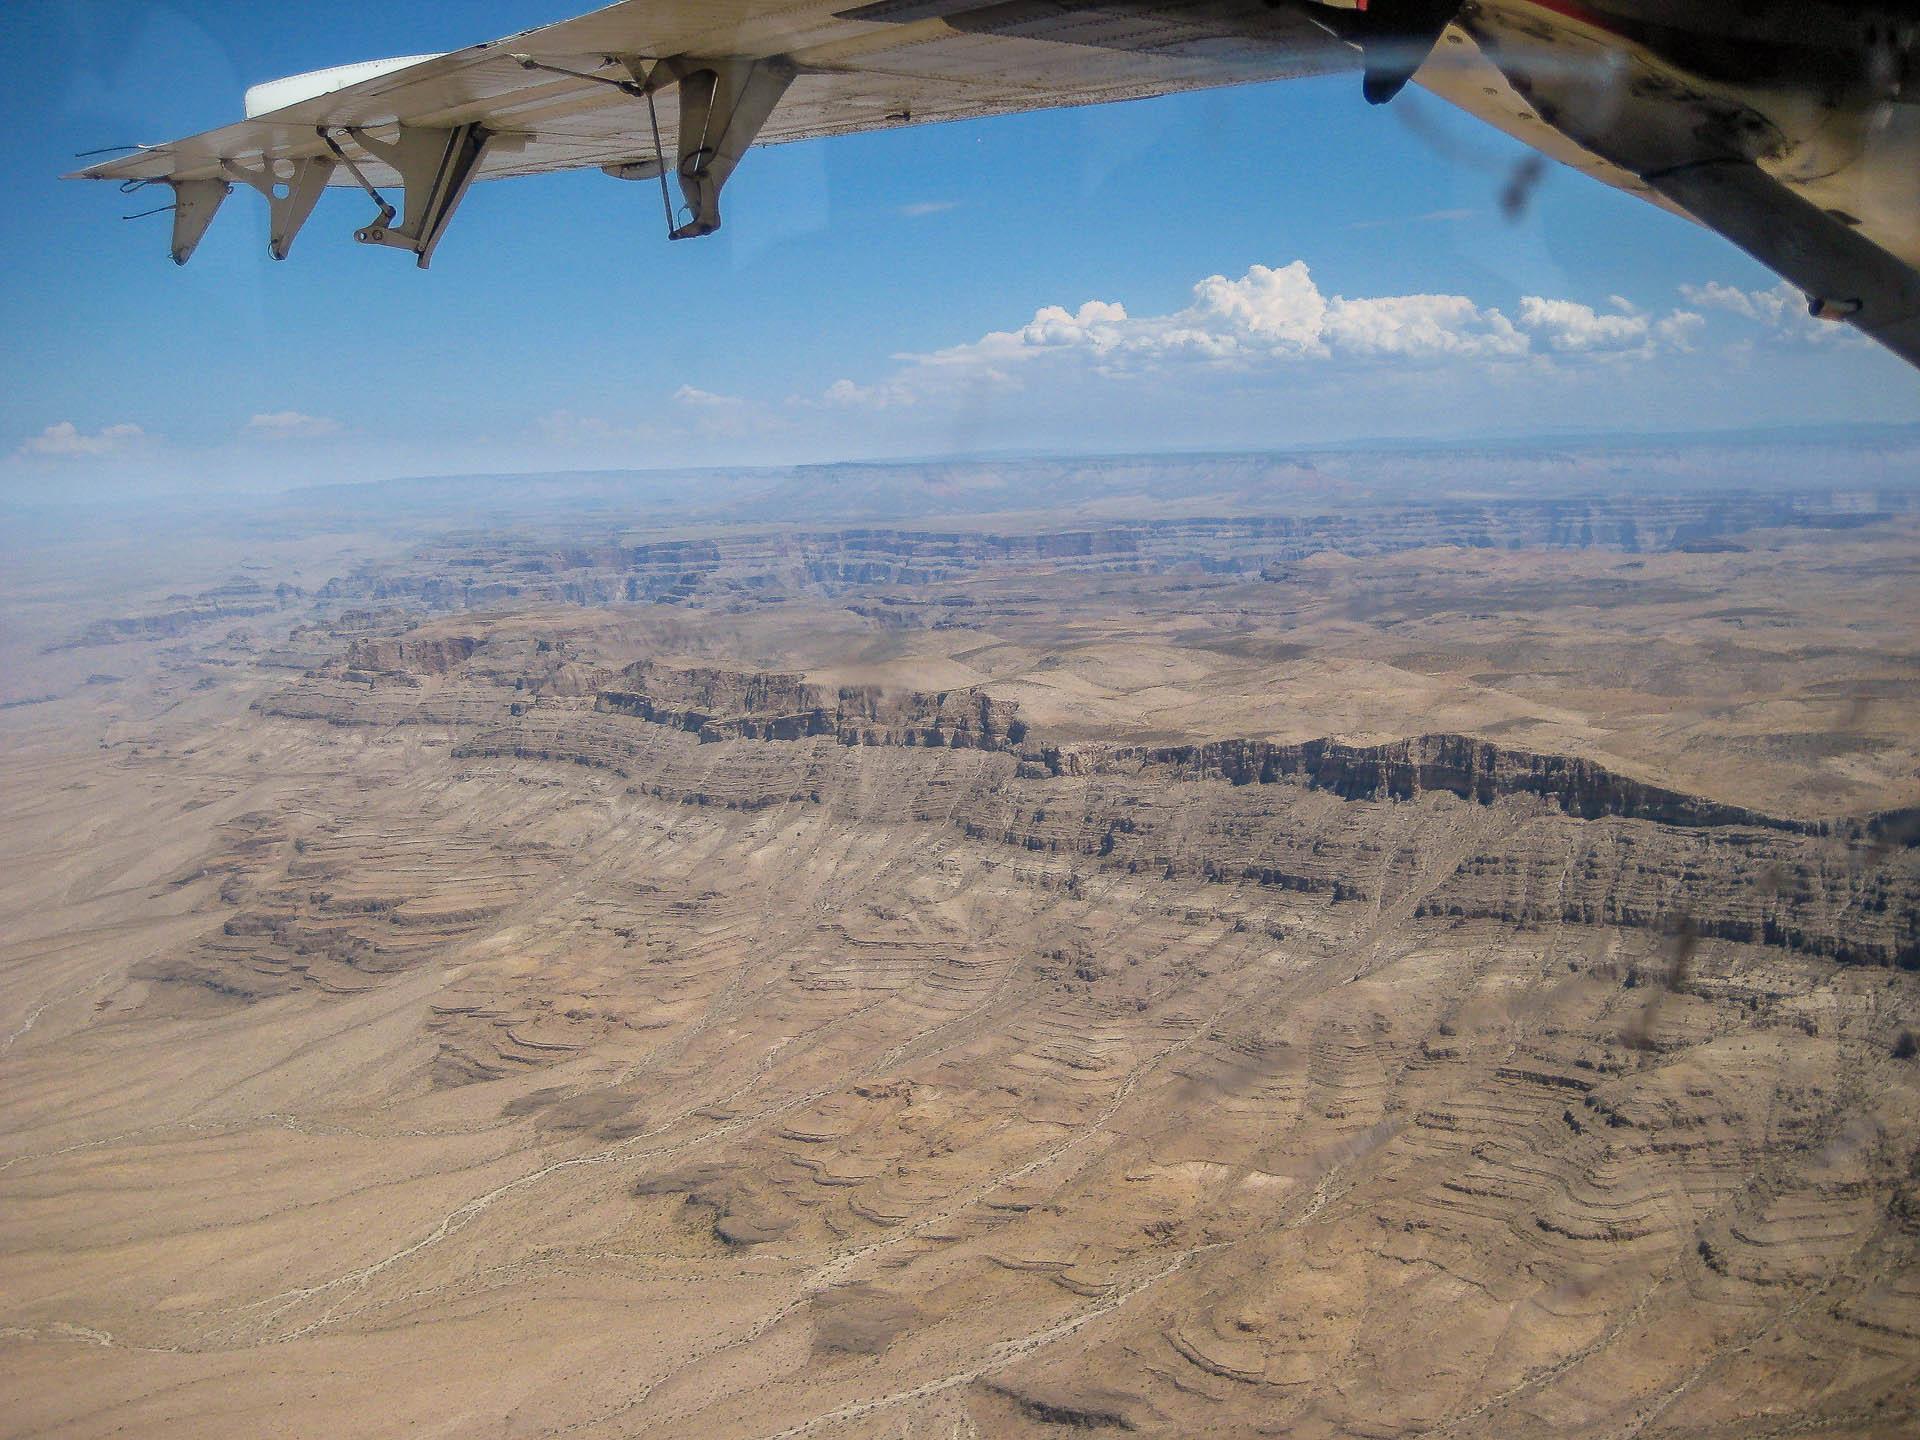 Anflug zum Grand Canyon